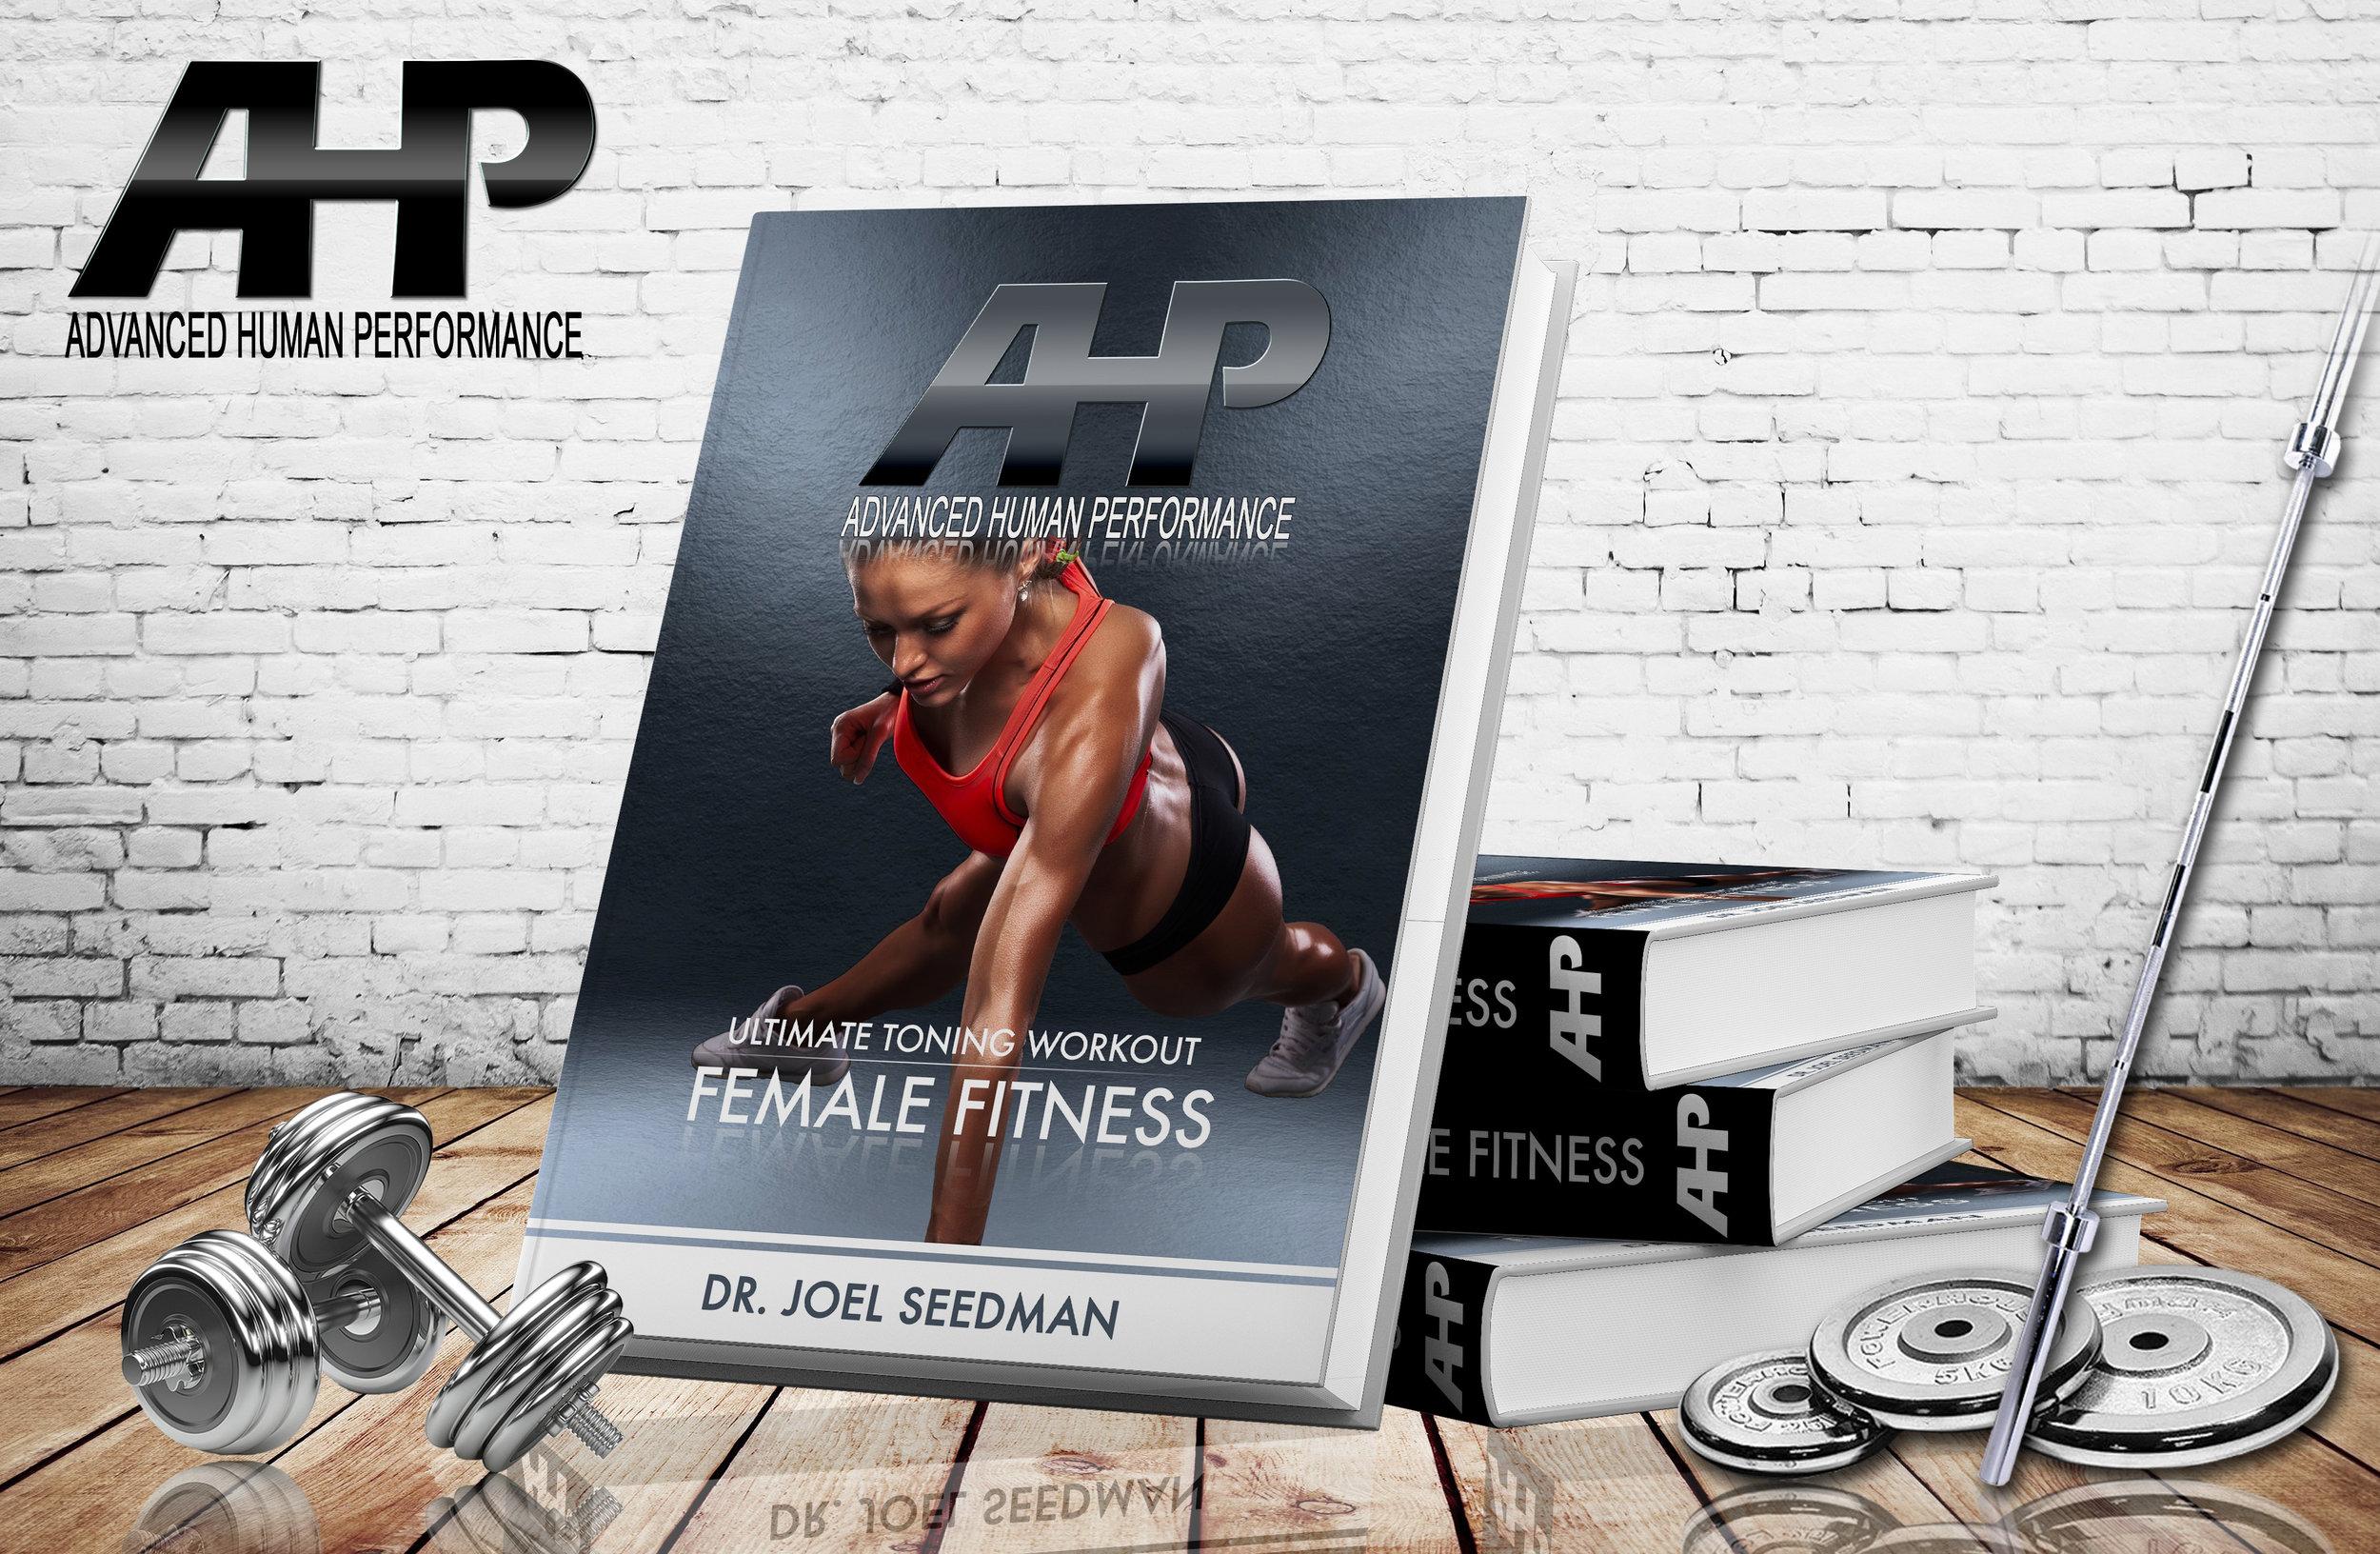 Female Fitness Training